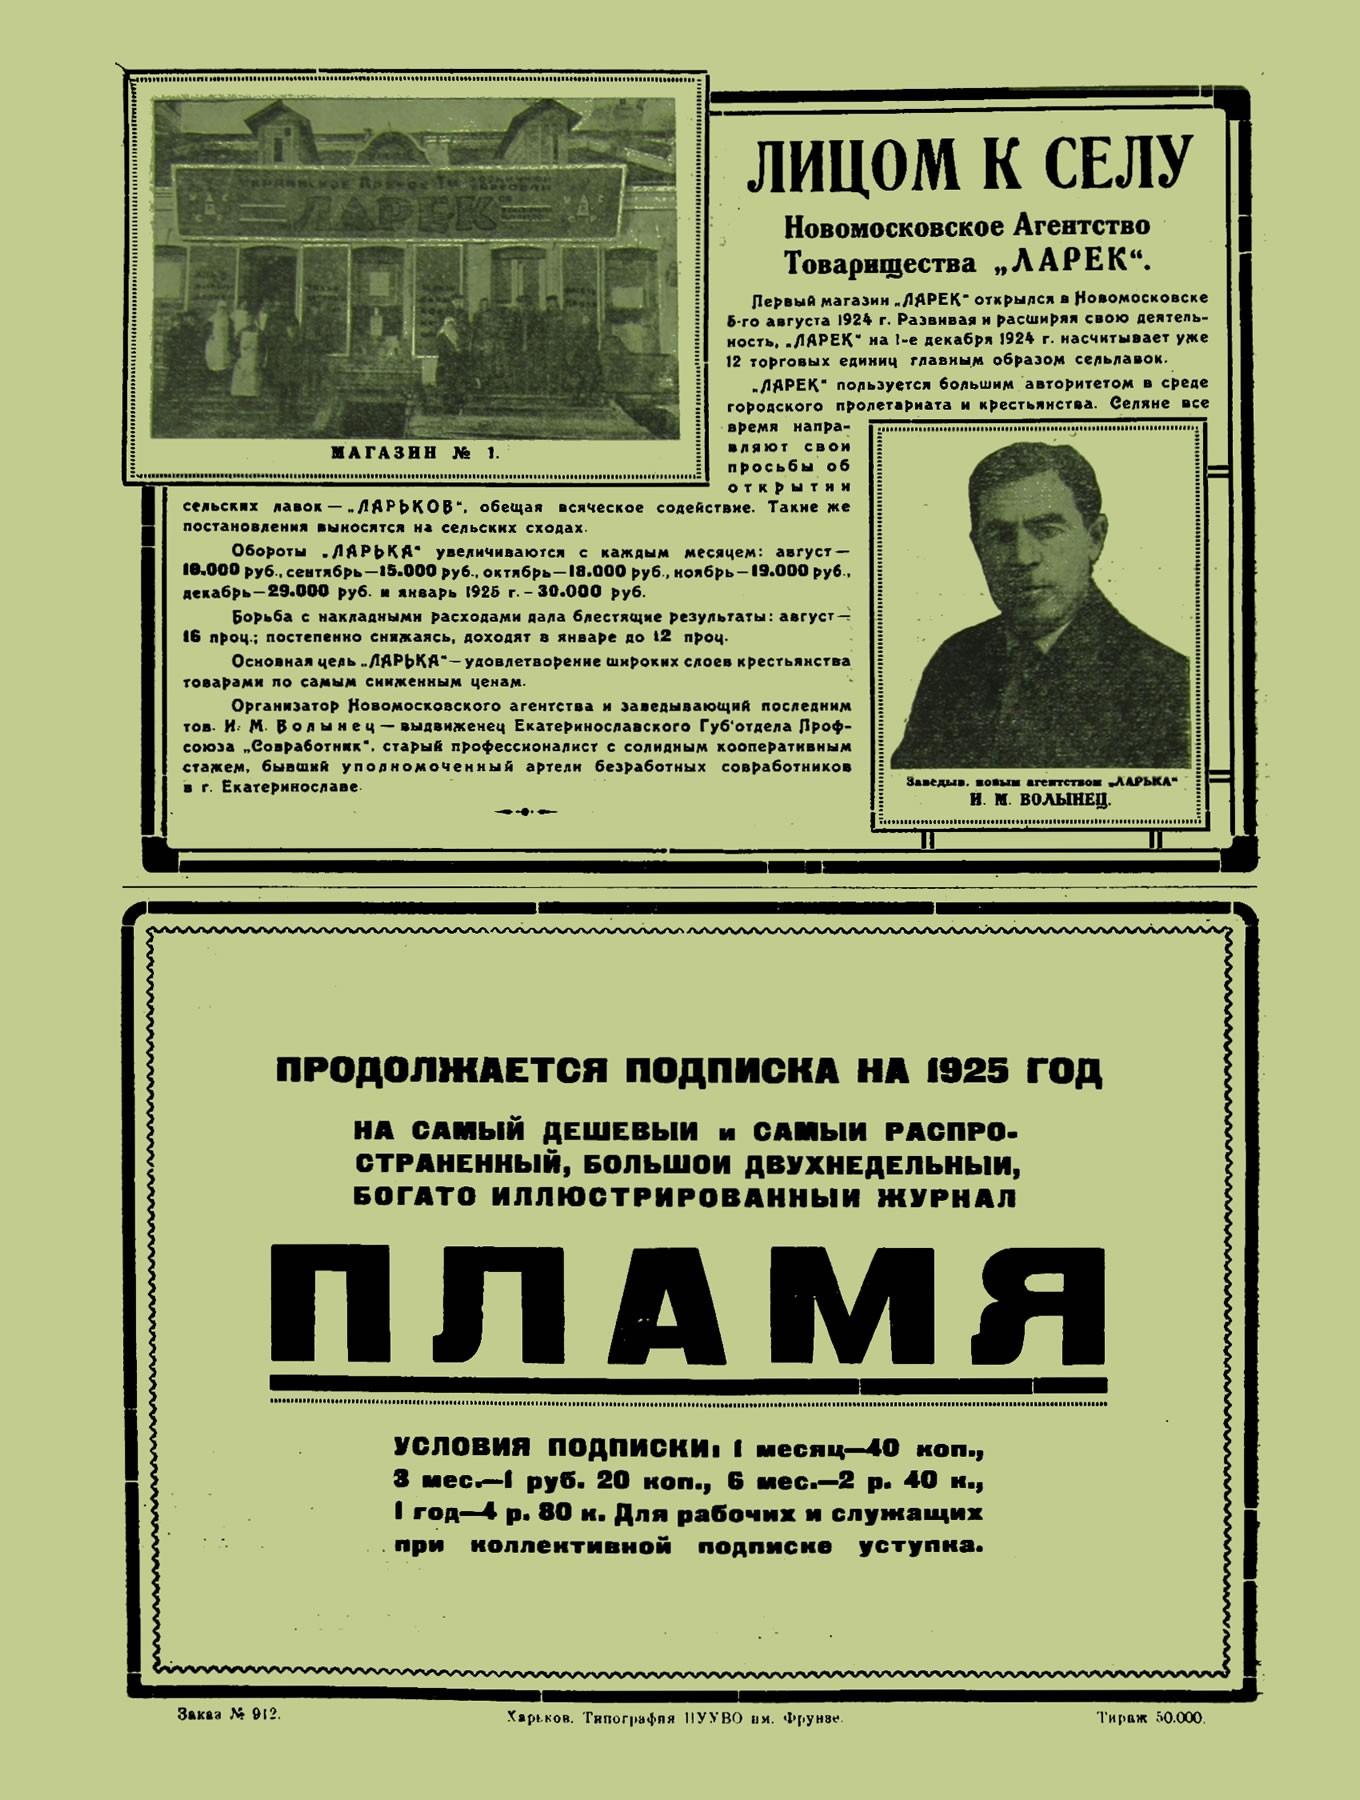 Пламя_1925_№4